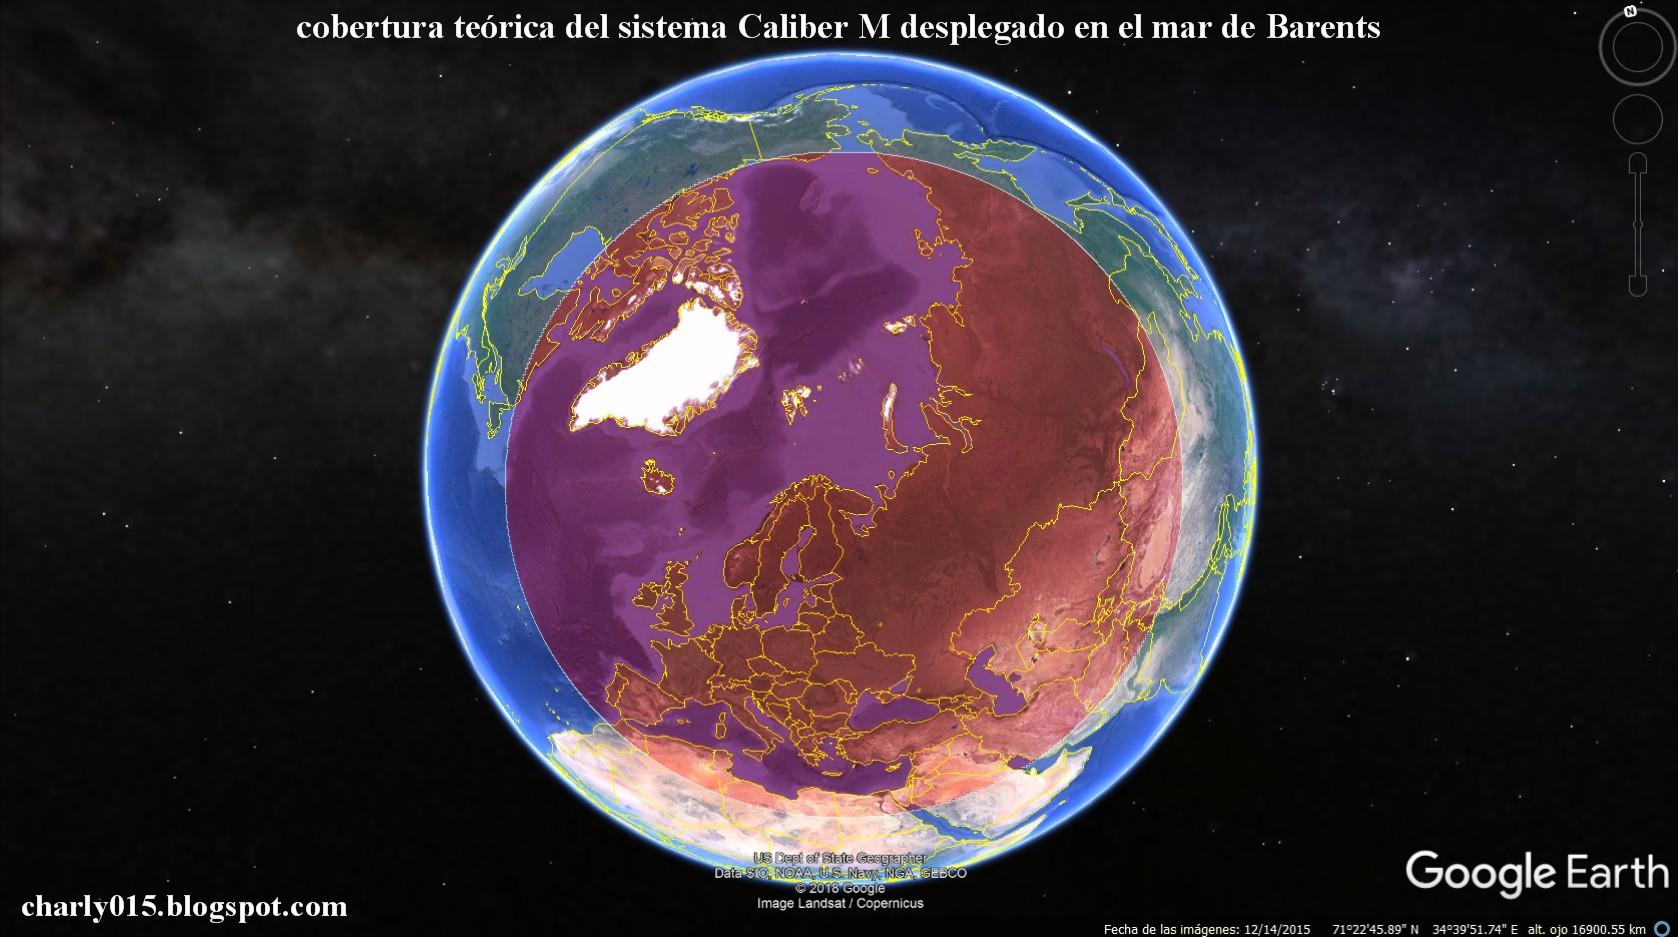 Kalibr missile system - Page 7 Egzqg26WsAEowN9?format=jpg&name=large